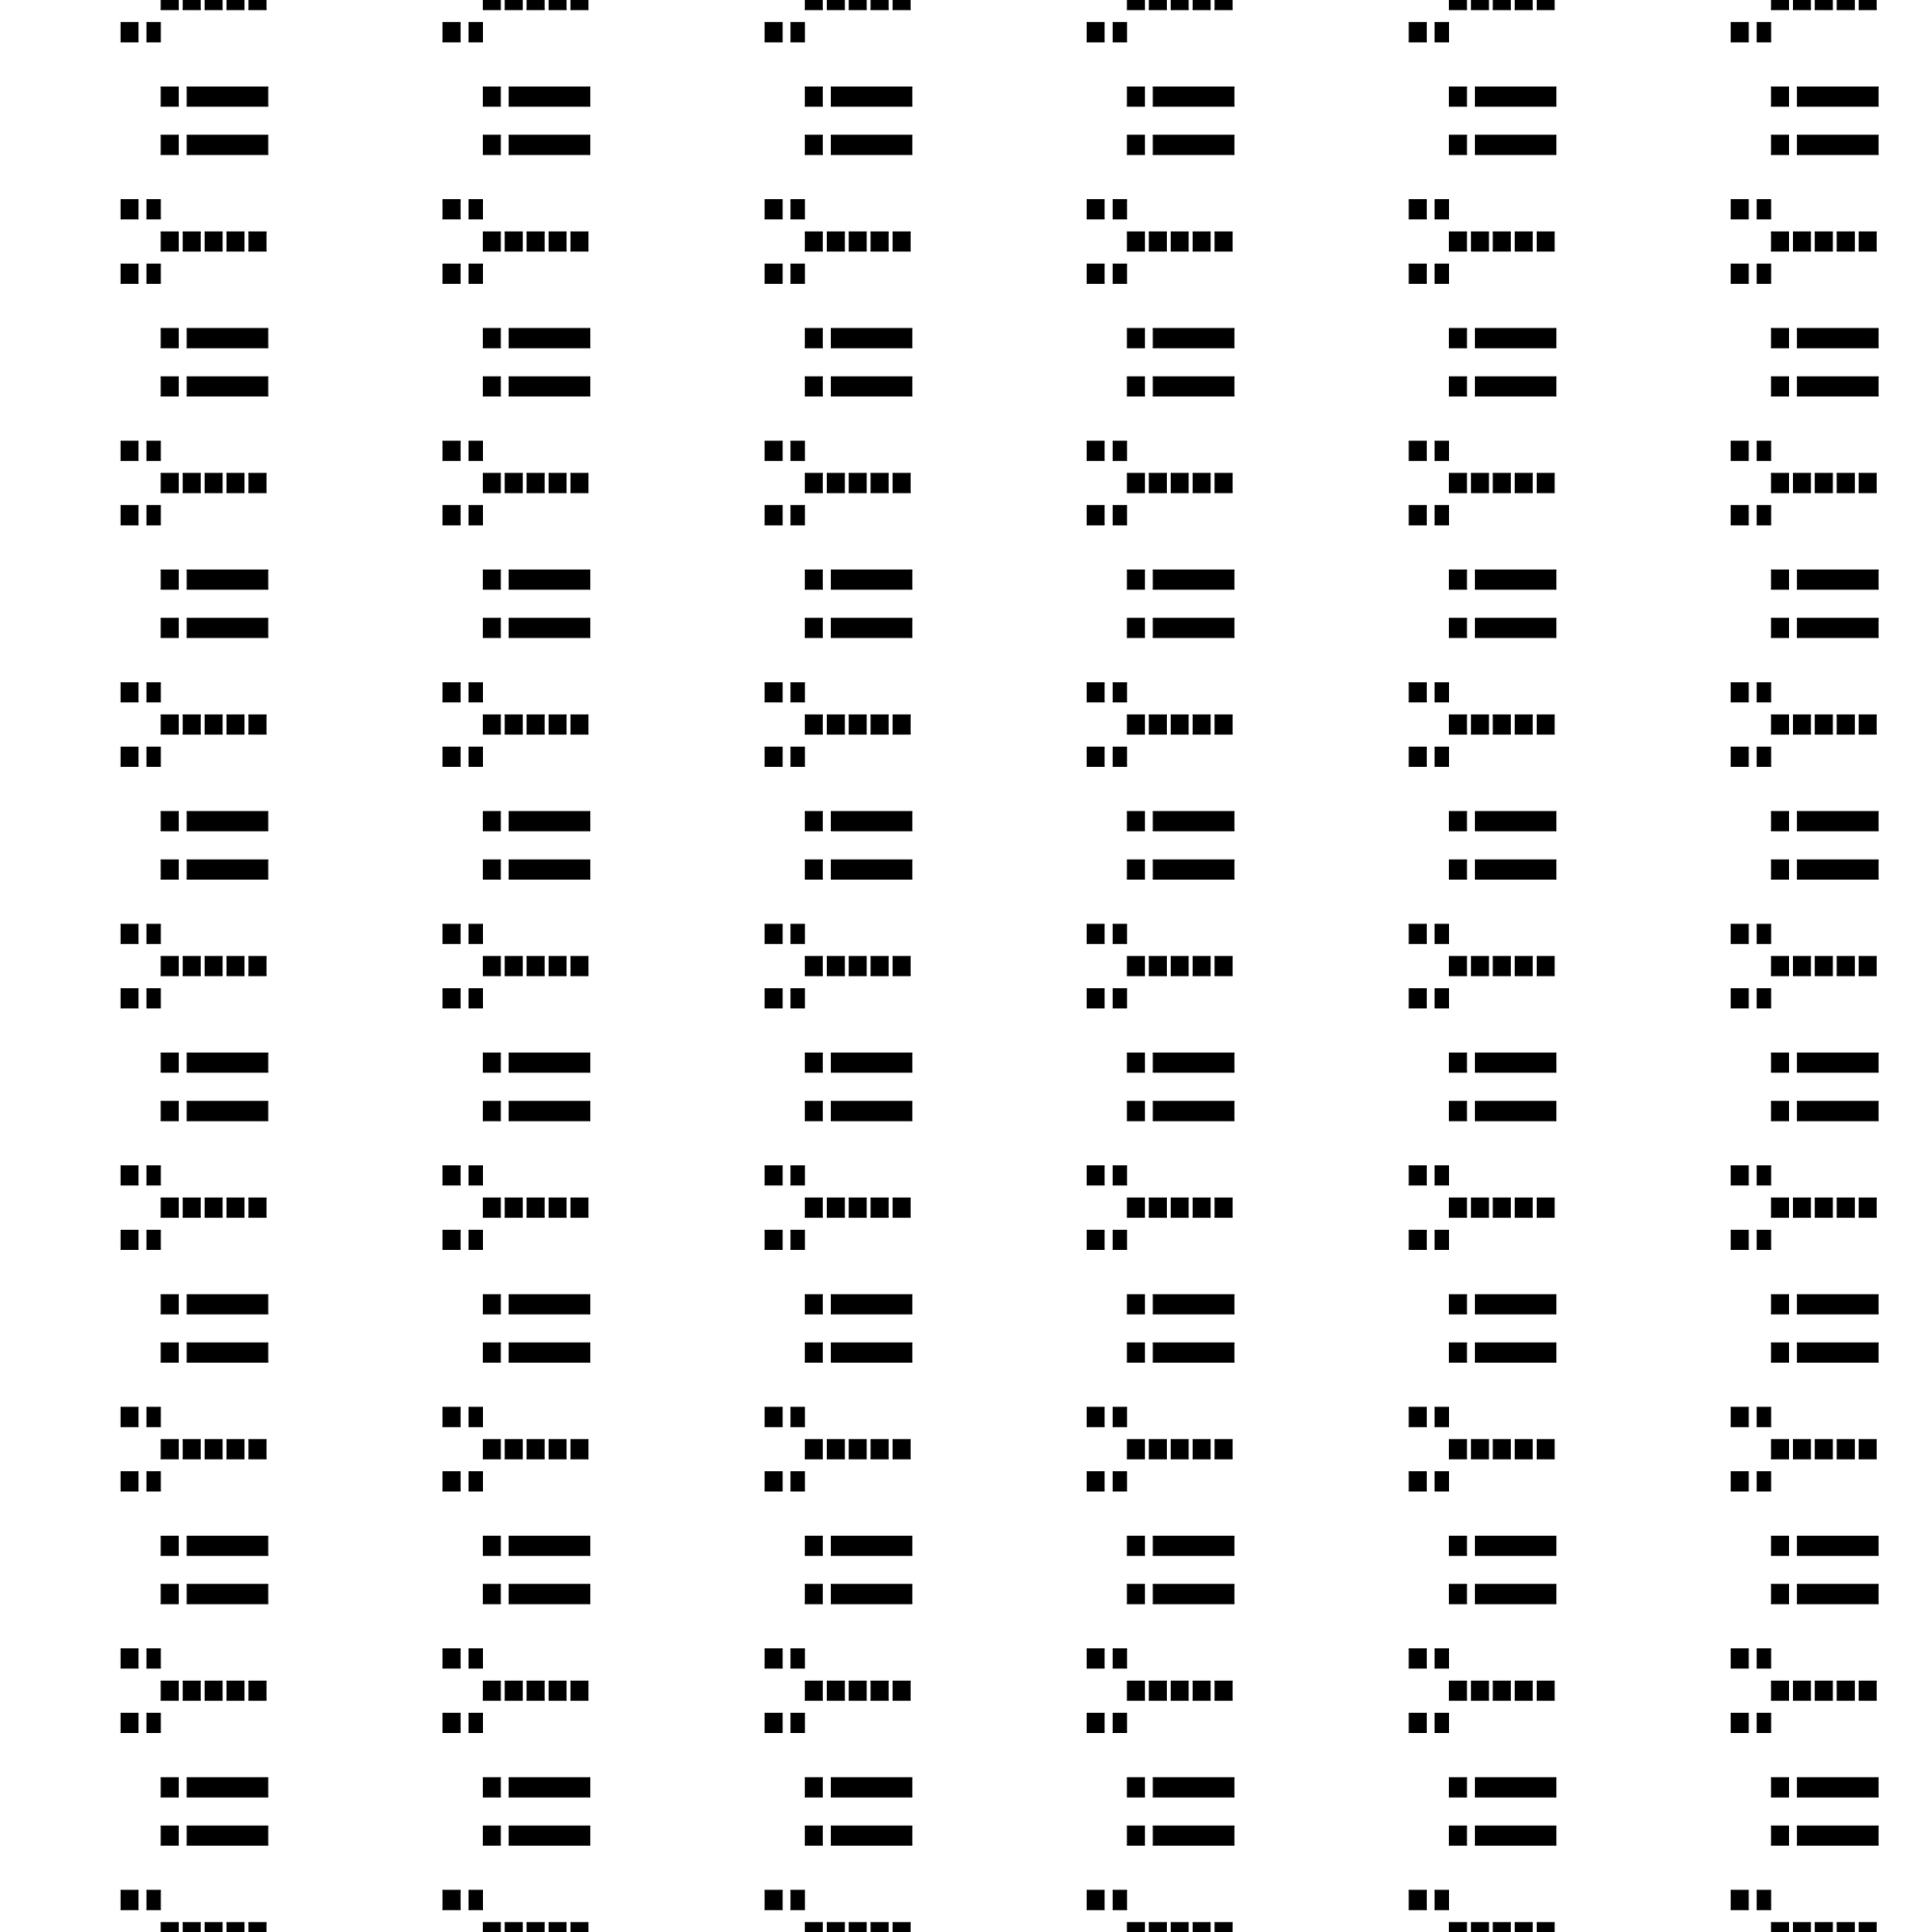 sheepairsupport_FF10_8K (20).jpg